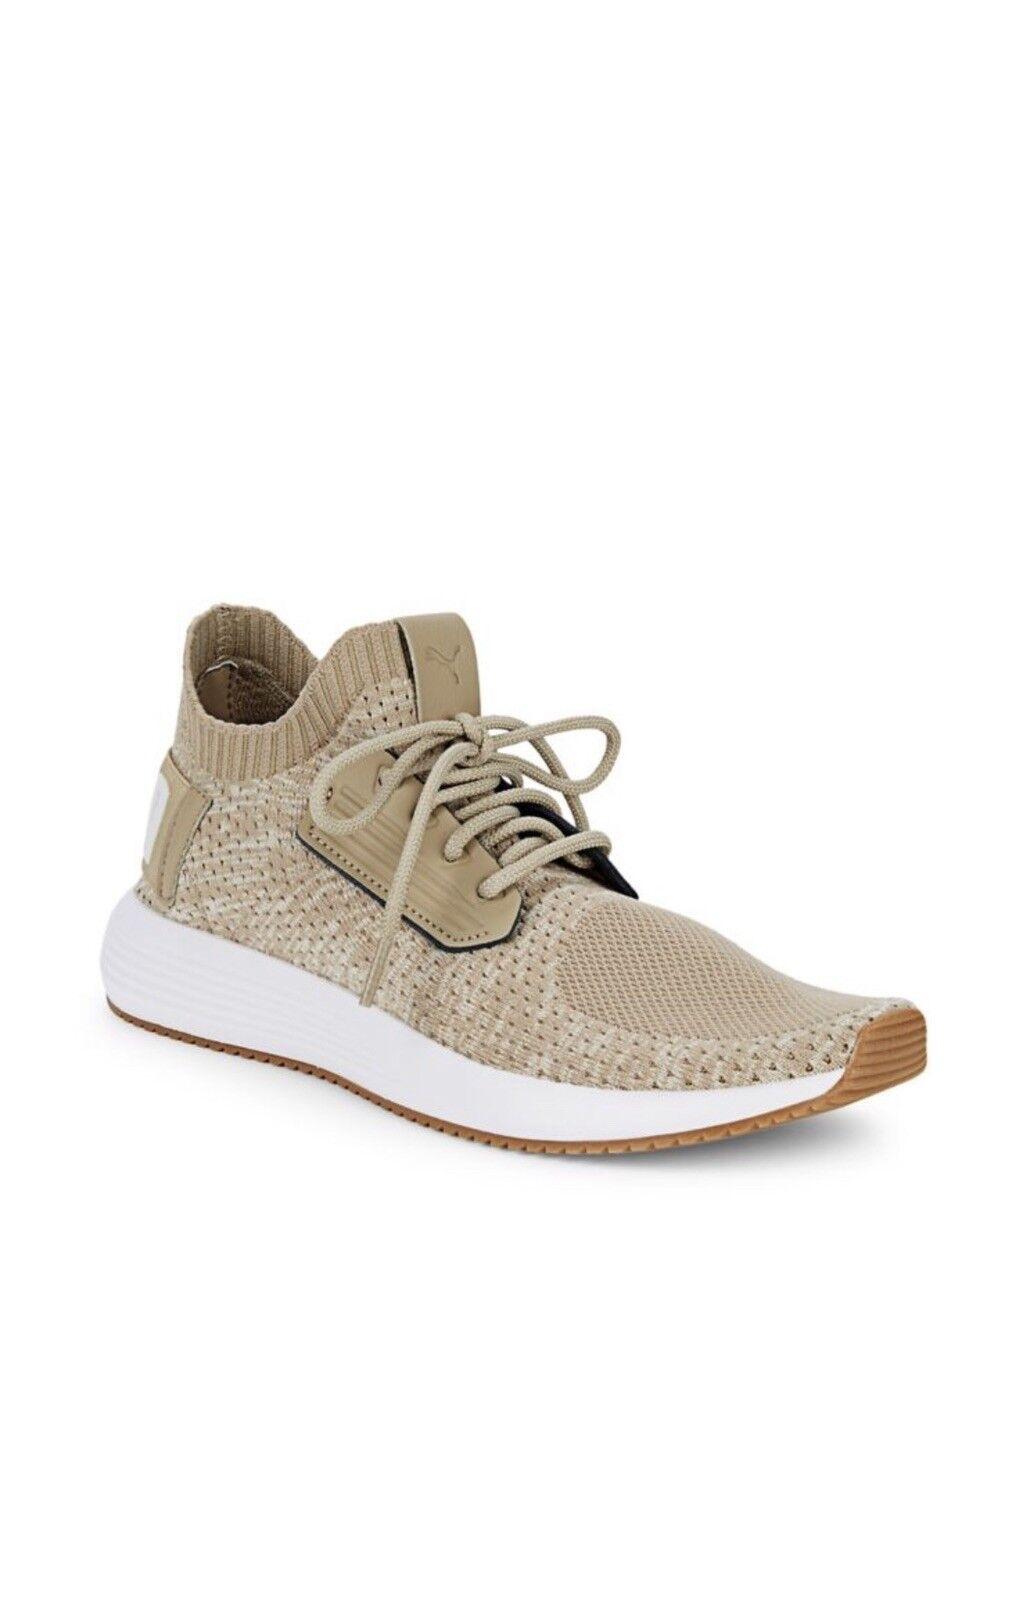 New PUMA Uprise Knit Men's Sneakers Evolution Size 9